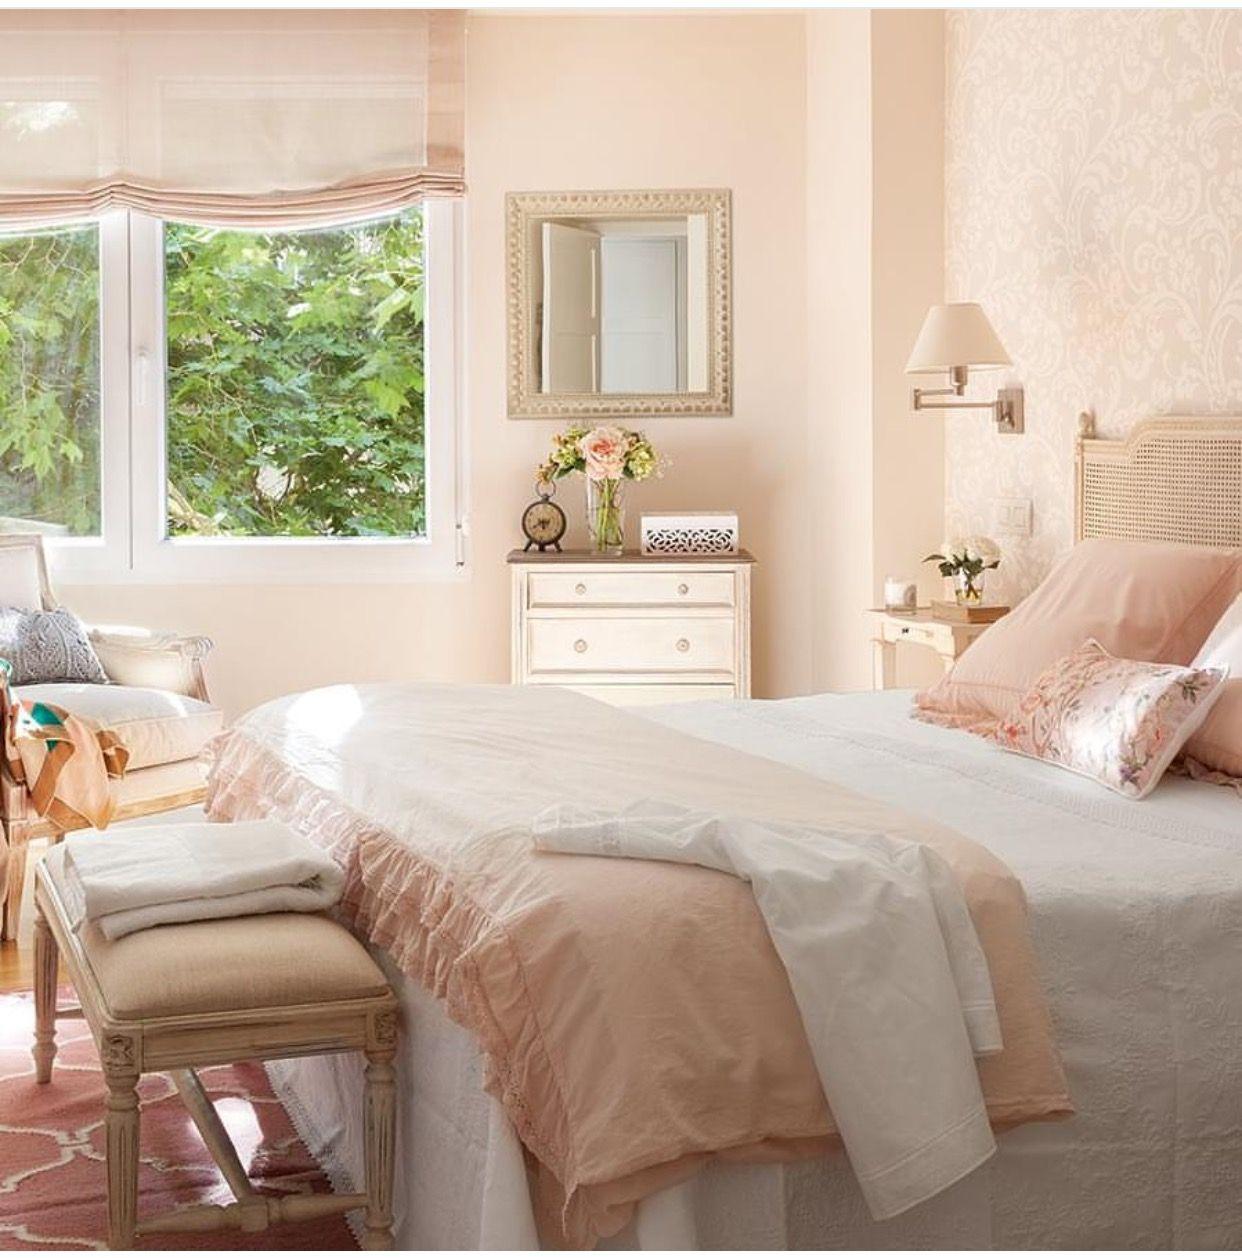 Pin de lilian ram rez angulo en recamaras de ni as - Pintar dormitorio principal ...